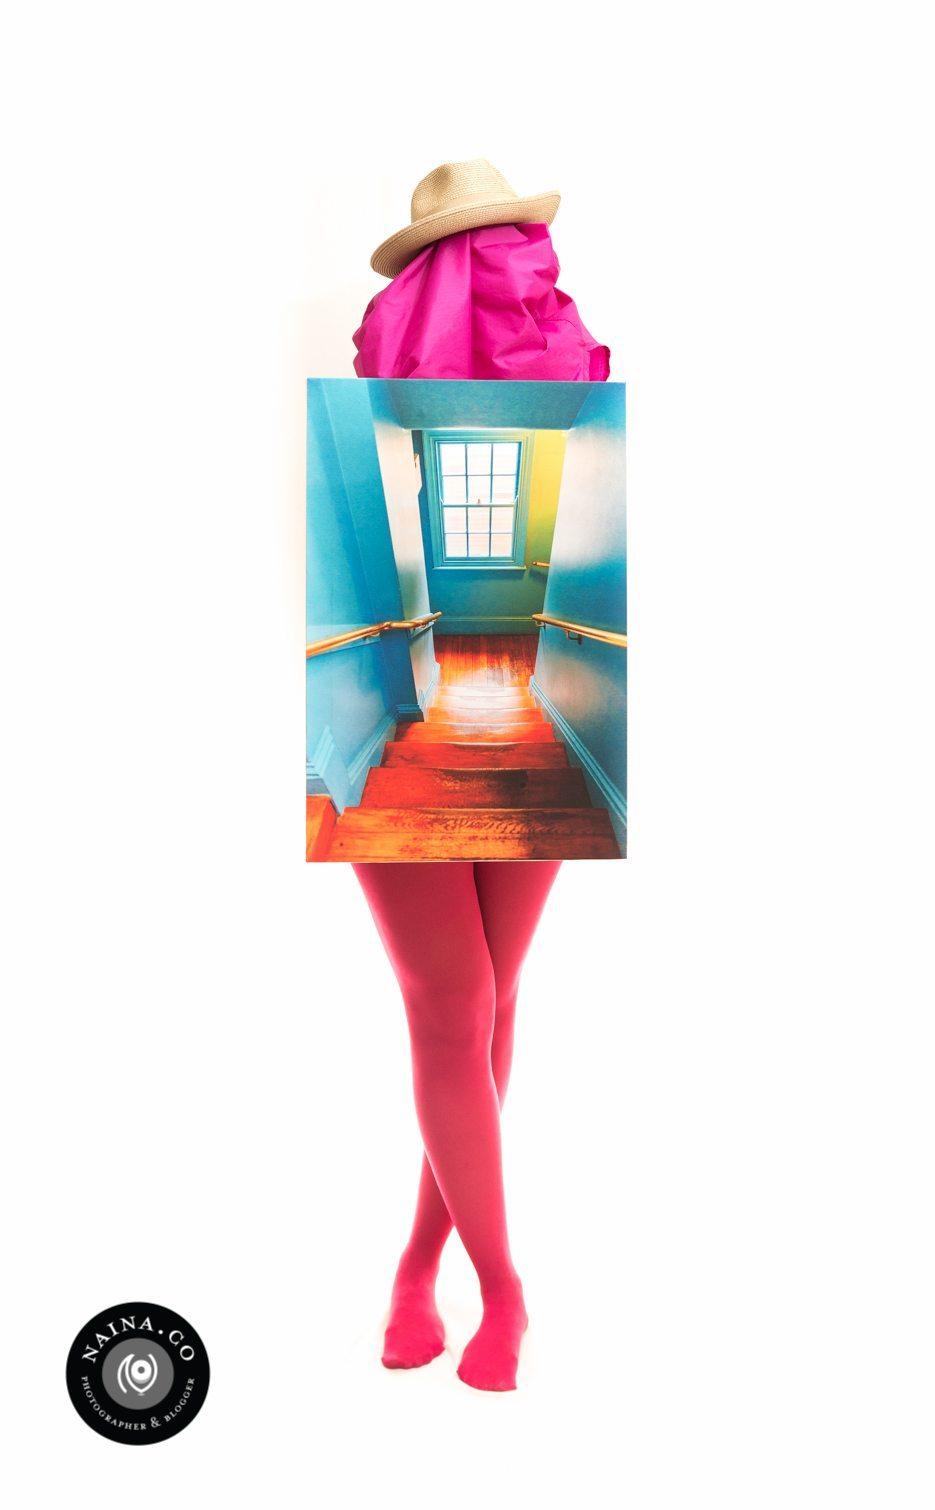 Naina.co-Raconteuse-Visuelle-Photographer-Blogger-Storyteller-Luxury-Lifestyle-January-2015-Canvas-Print-Framed-Art-Staircase-Store-Shop-Blue